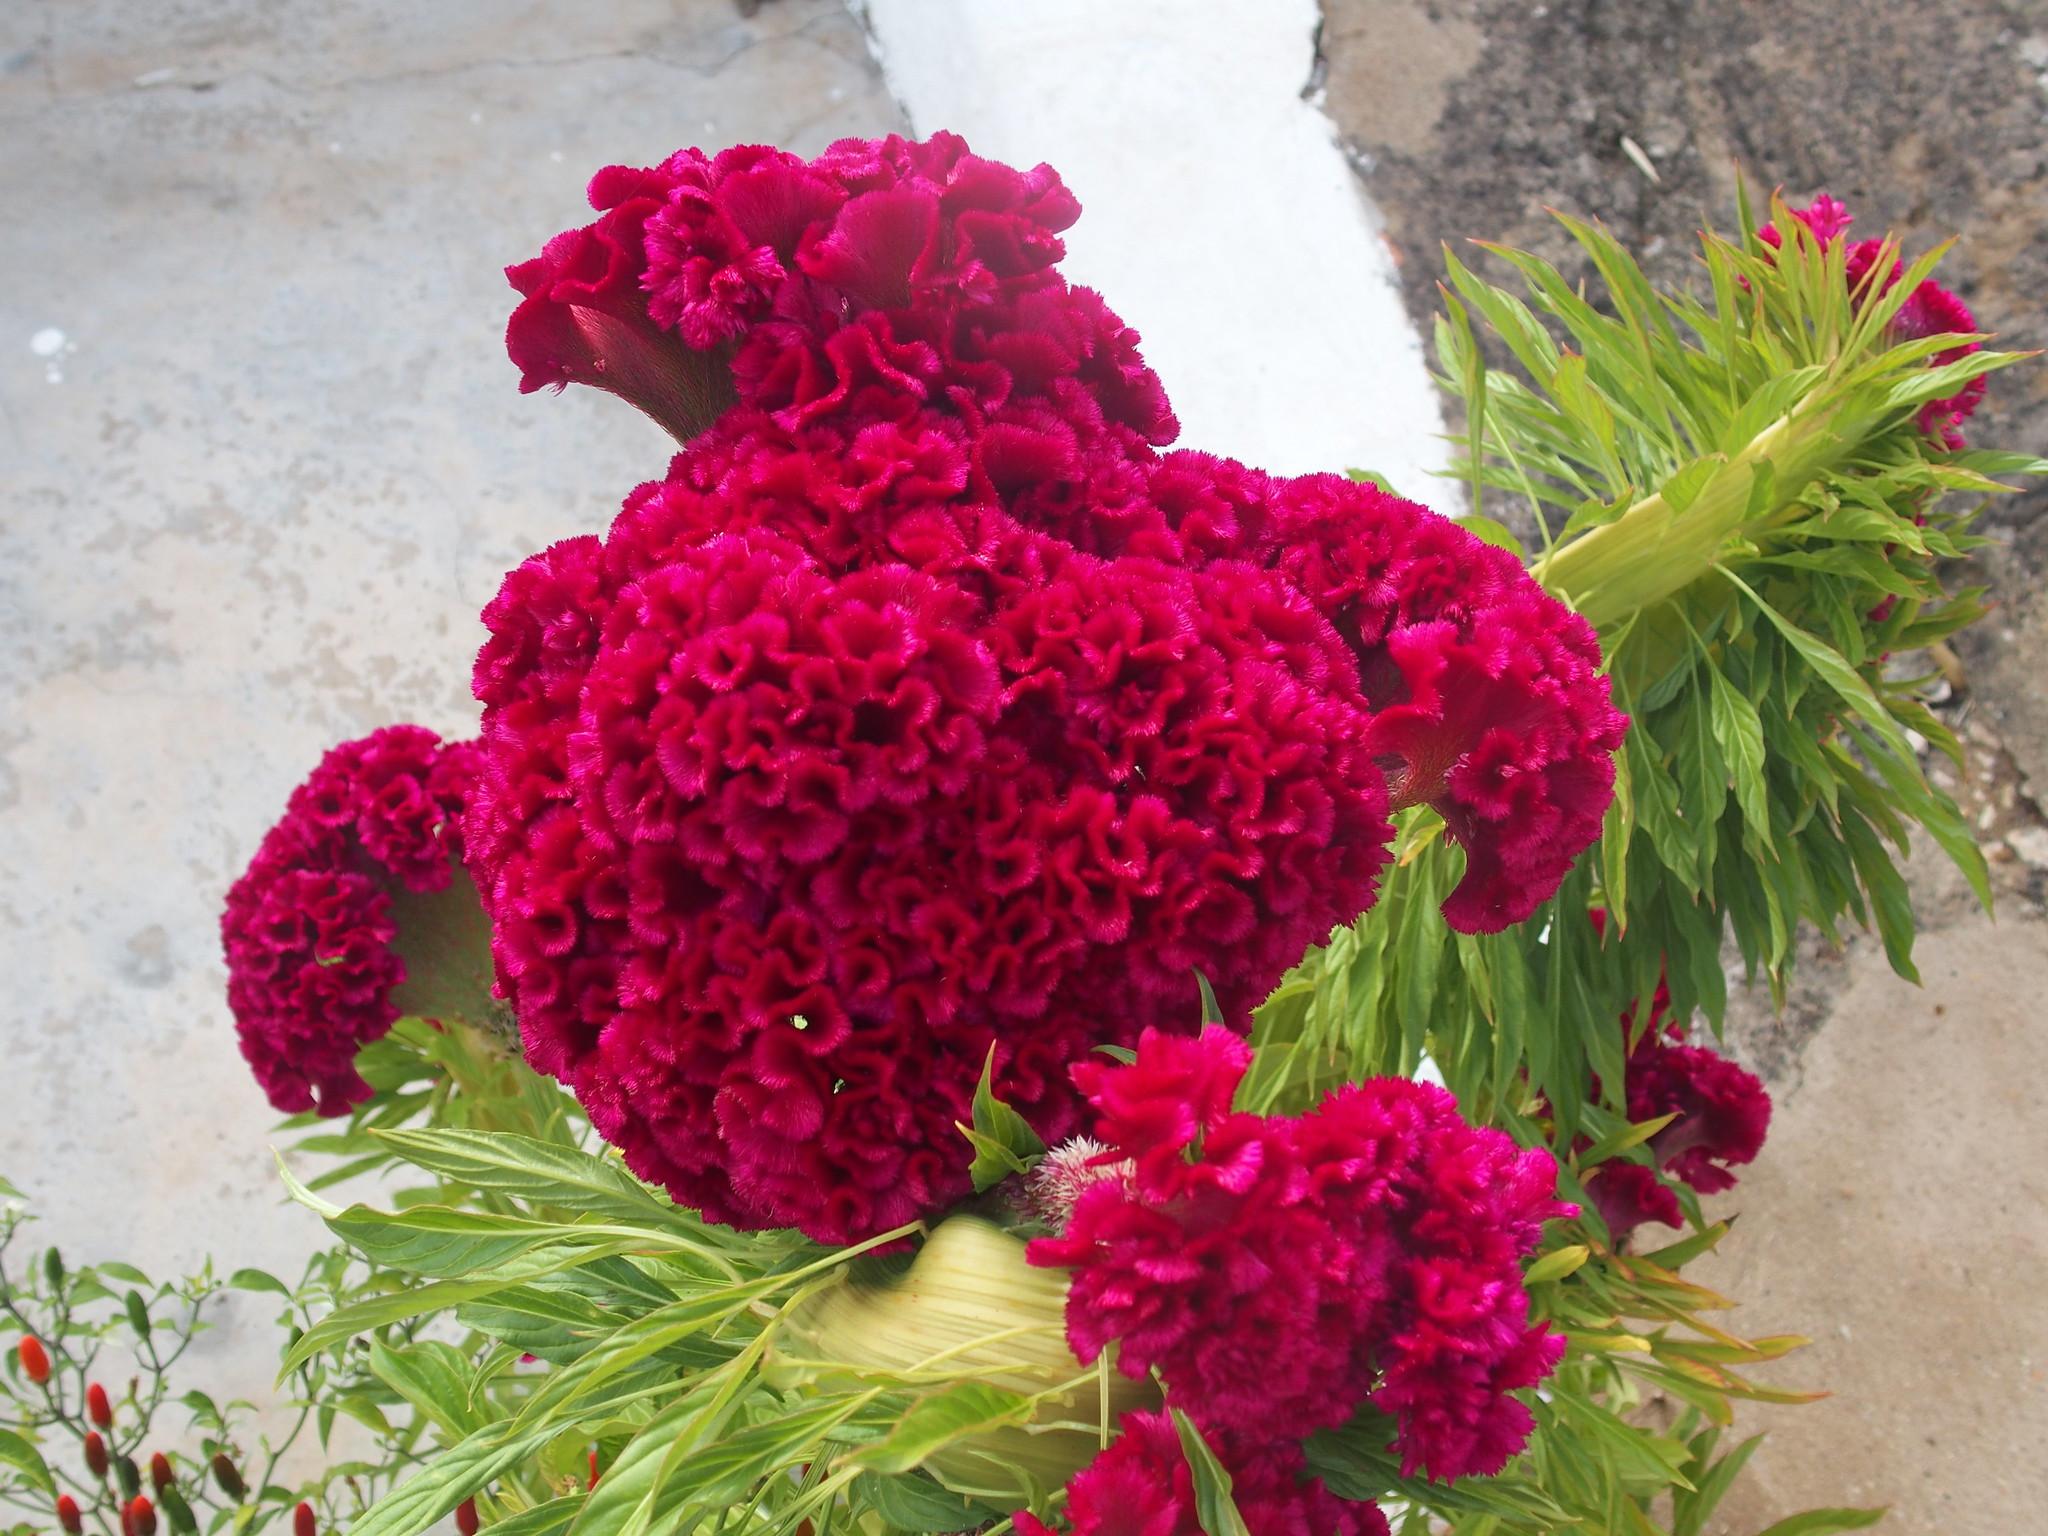 A11 Vacker okänd blomma